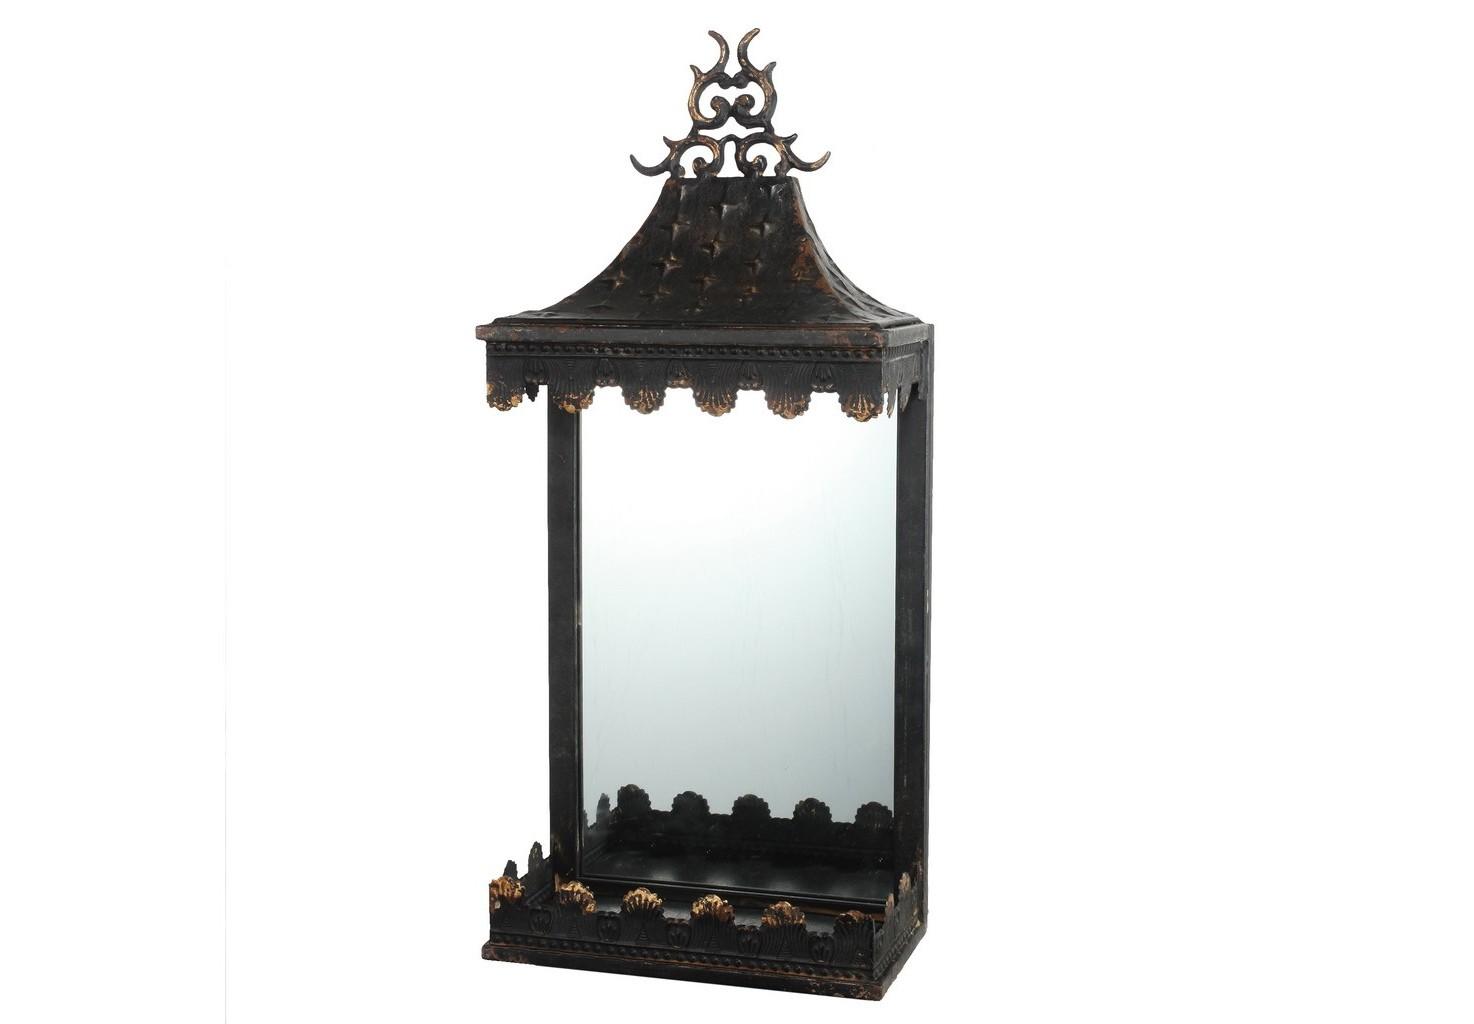 ЗеркалоНастенные зеркала<br><br><br>Material: Металл<br>Ширина см: 25<br>Высота см: 58<br>Глубина см: 14